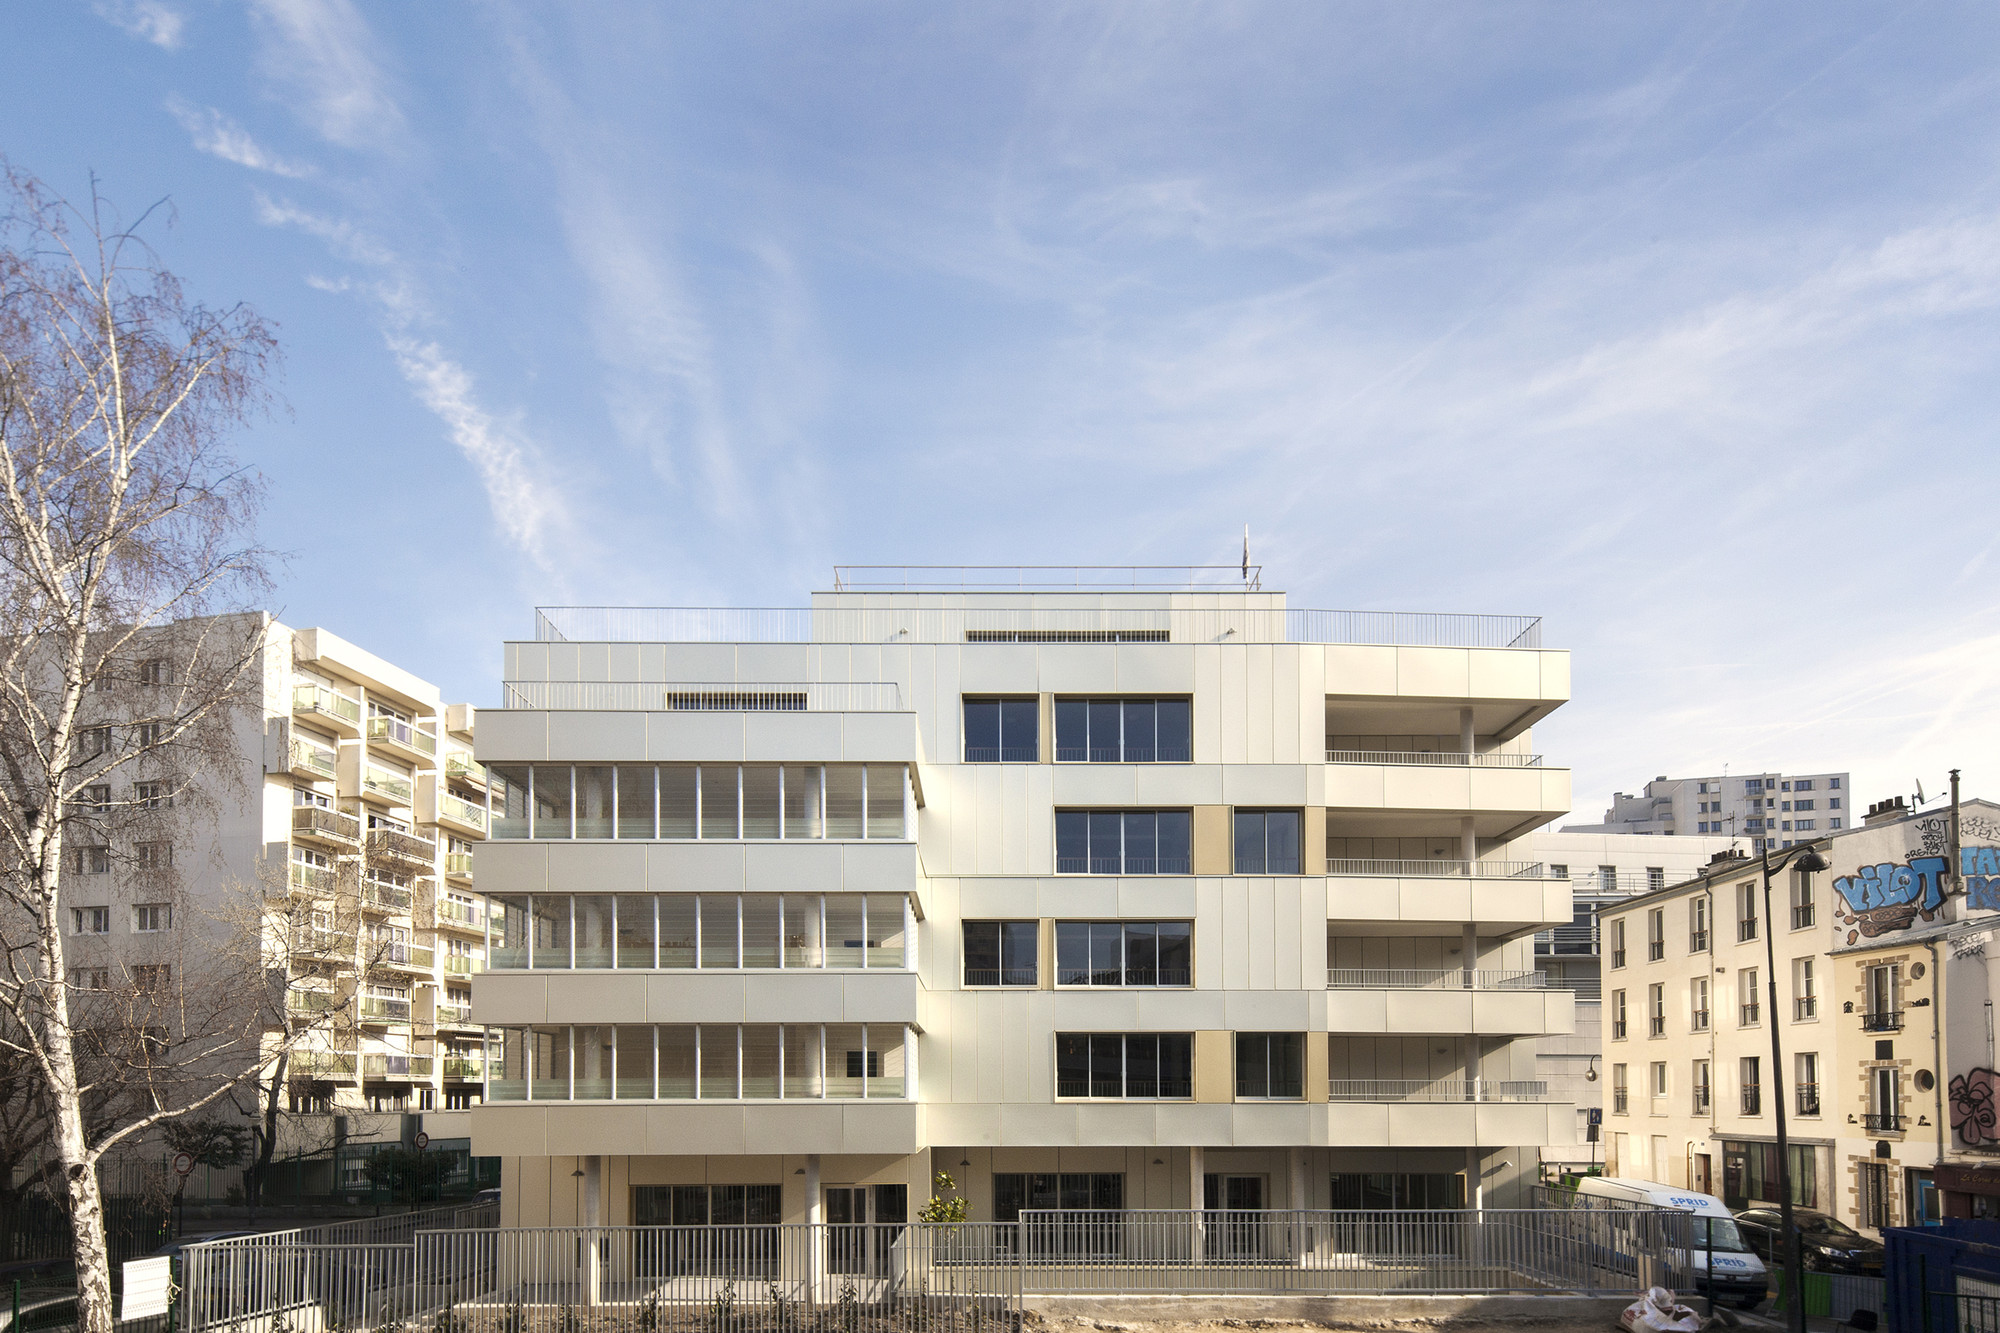 Residence Alice Guy / ADE architectes - David Elalouf & Guillaume Prognon, © Pauline Turmel